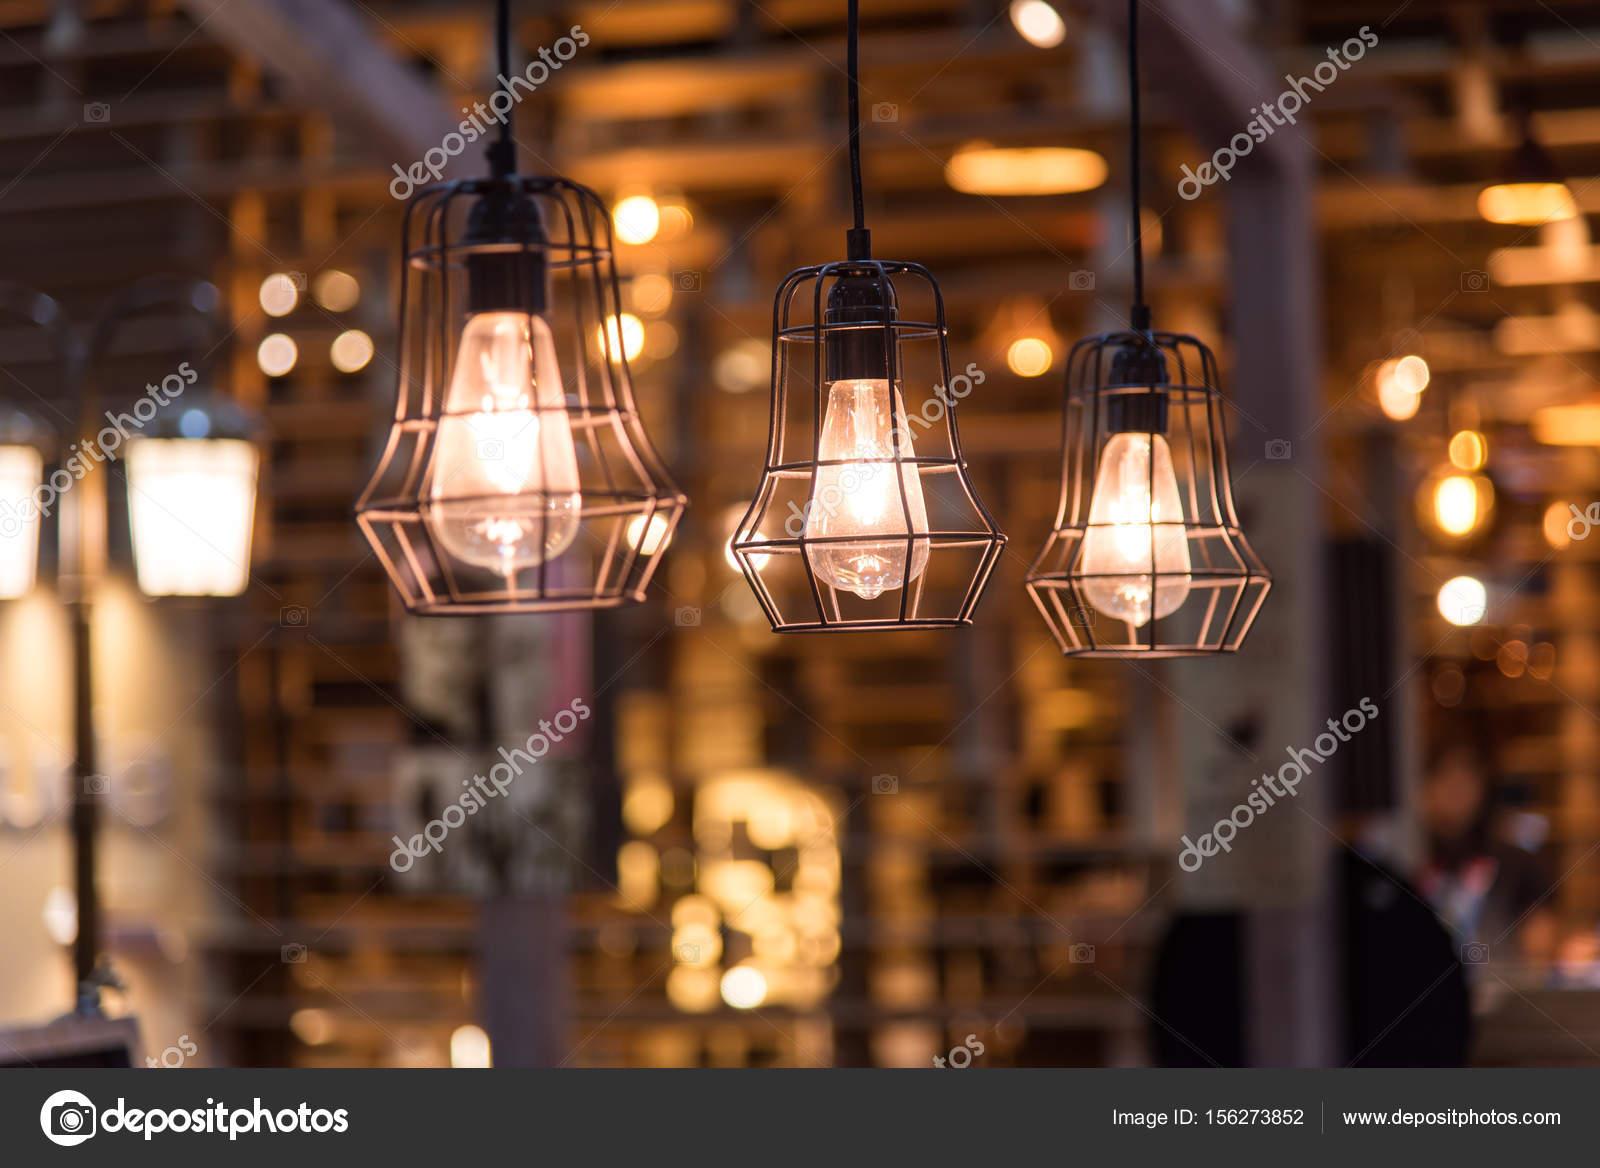 vintage verlichting decoratie op houten muur achtergrond stockfoto